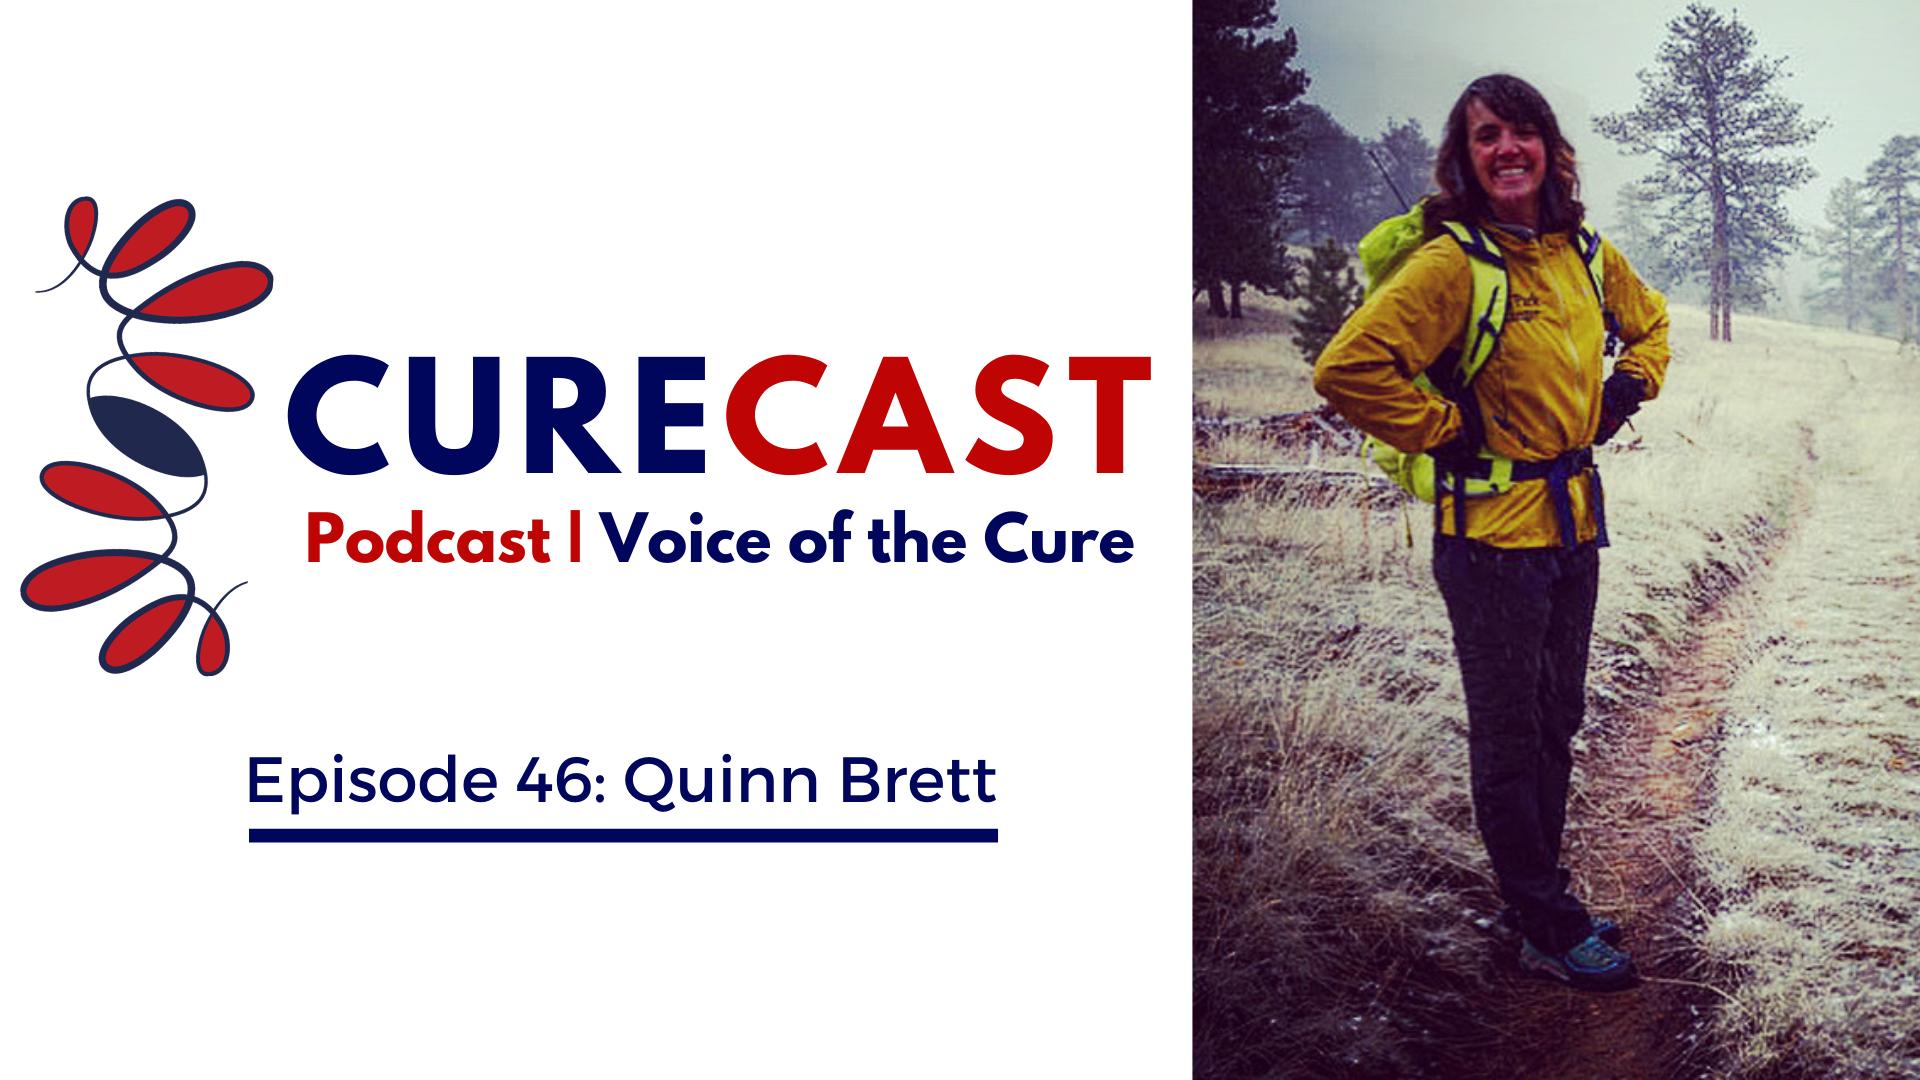 CureCast Episode 46: Quinn Brett